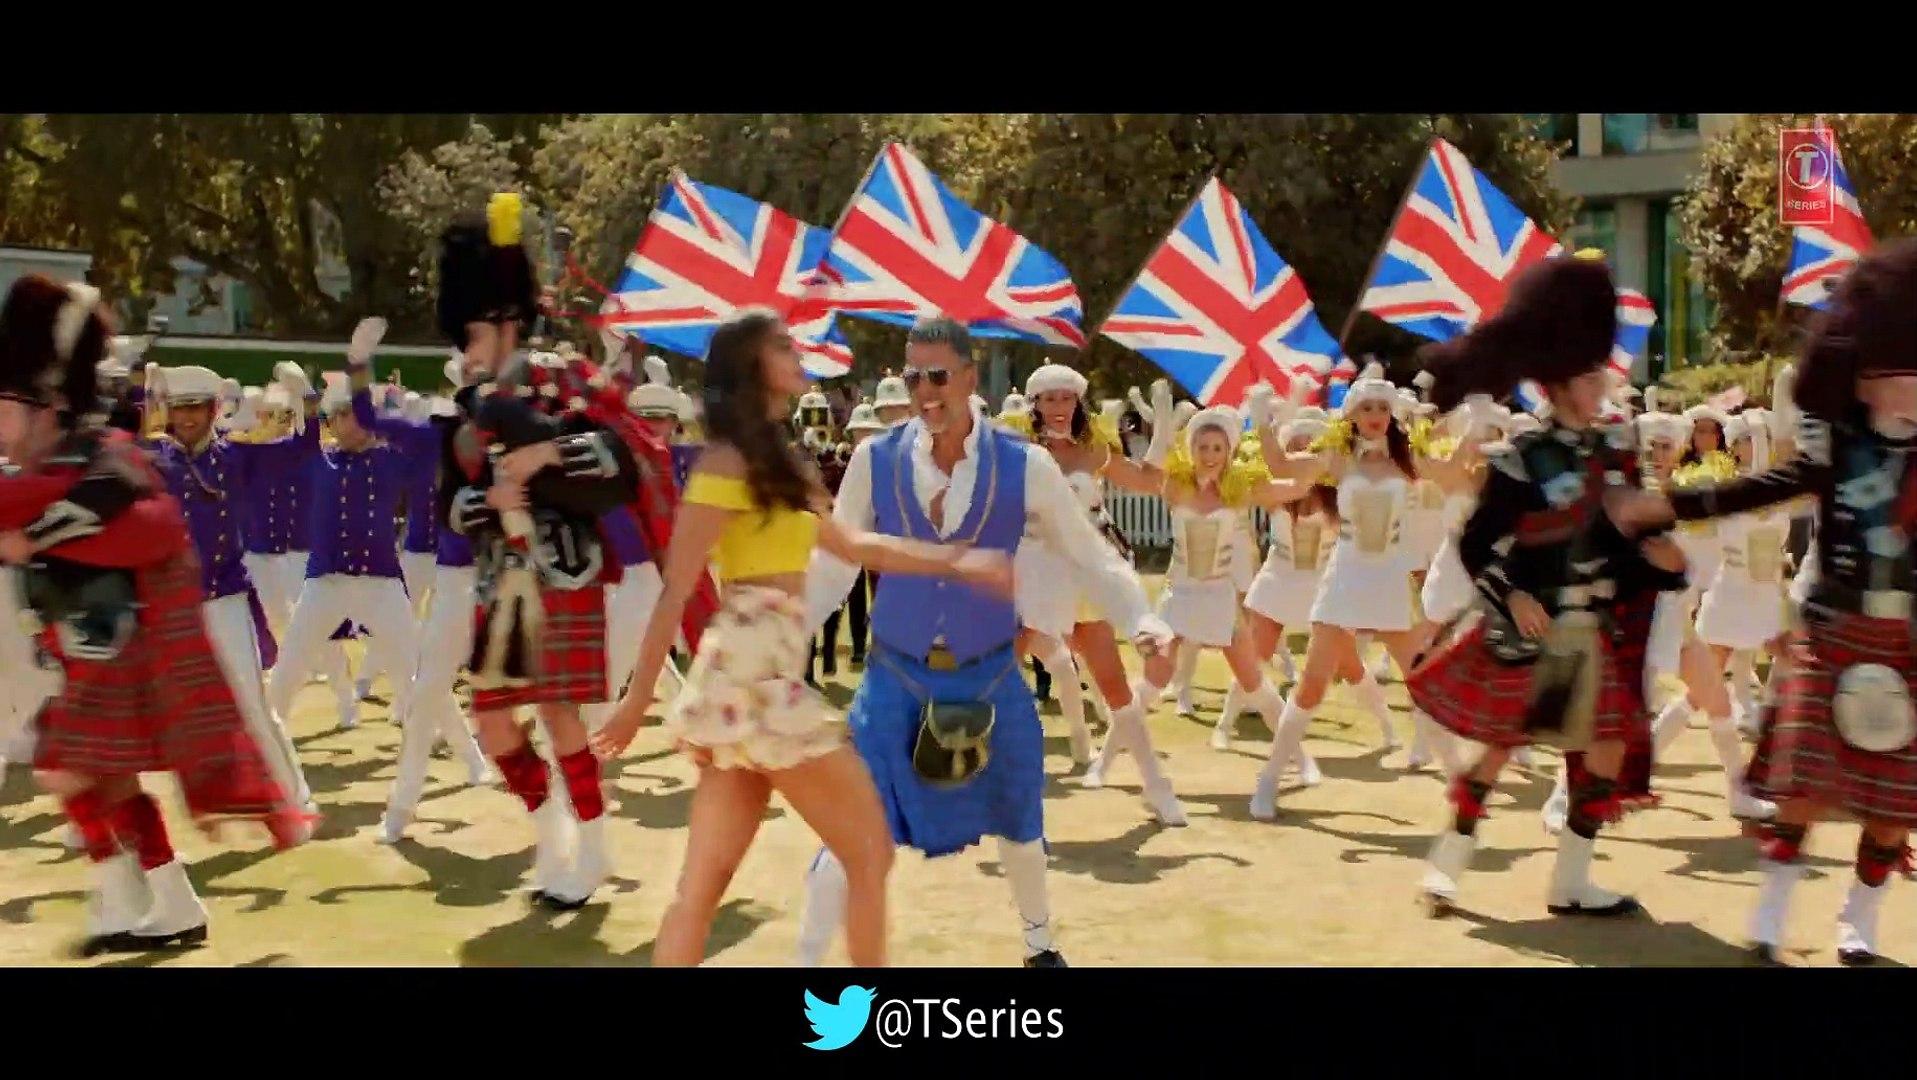 Ek Chumma Video   Housefull 4   Akshay K, Riteish D, Bobby D, Kriti S, Pooja, Kriti K   Flixaap